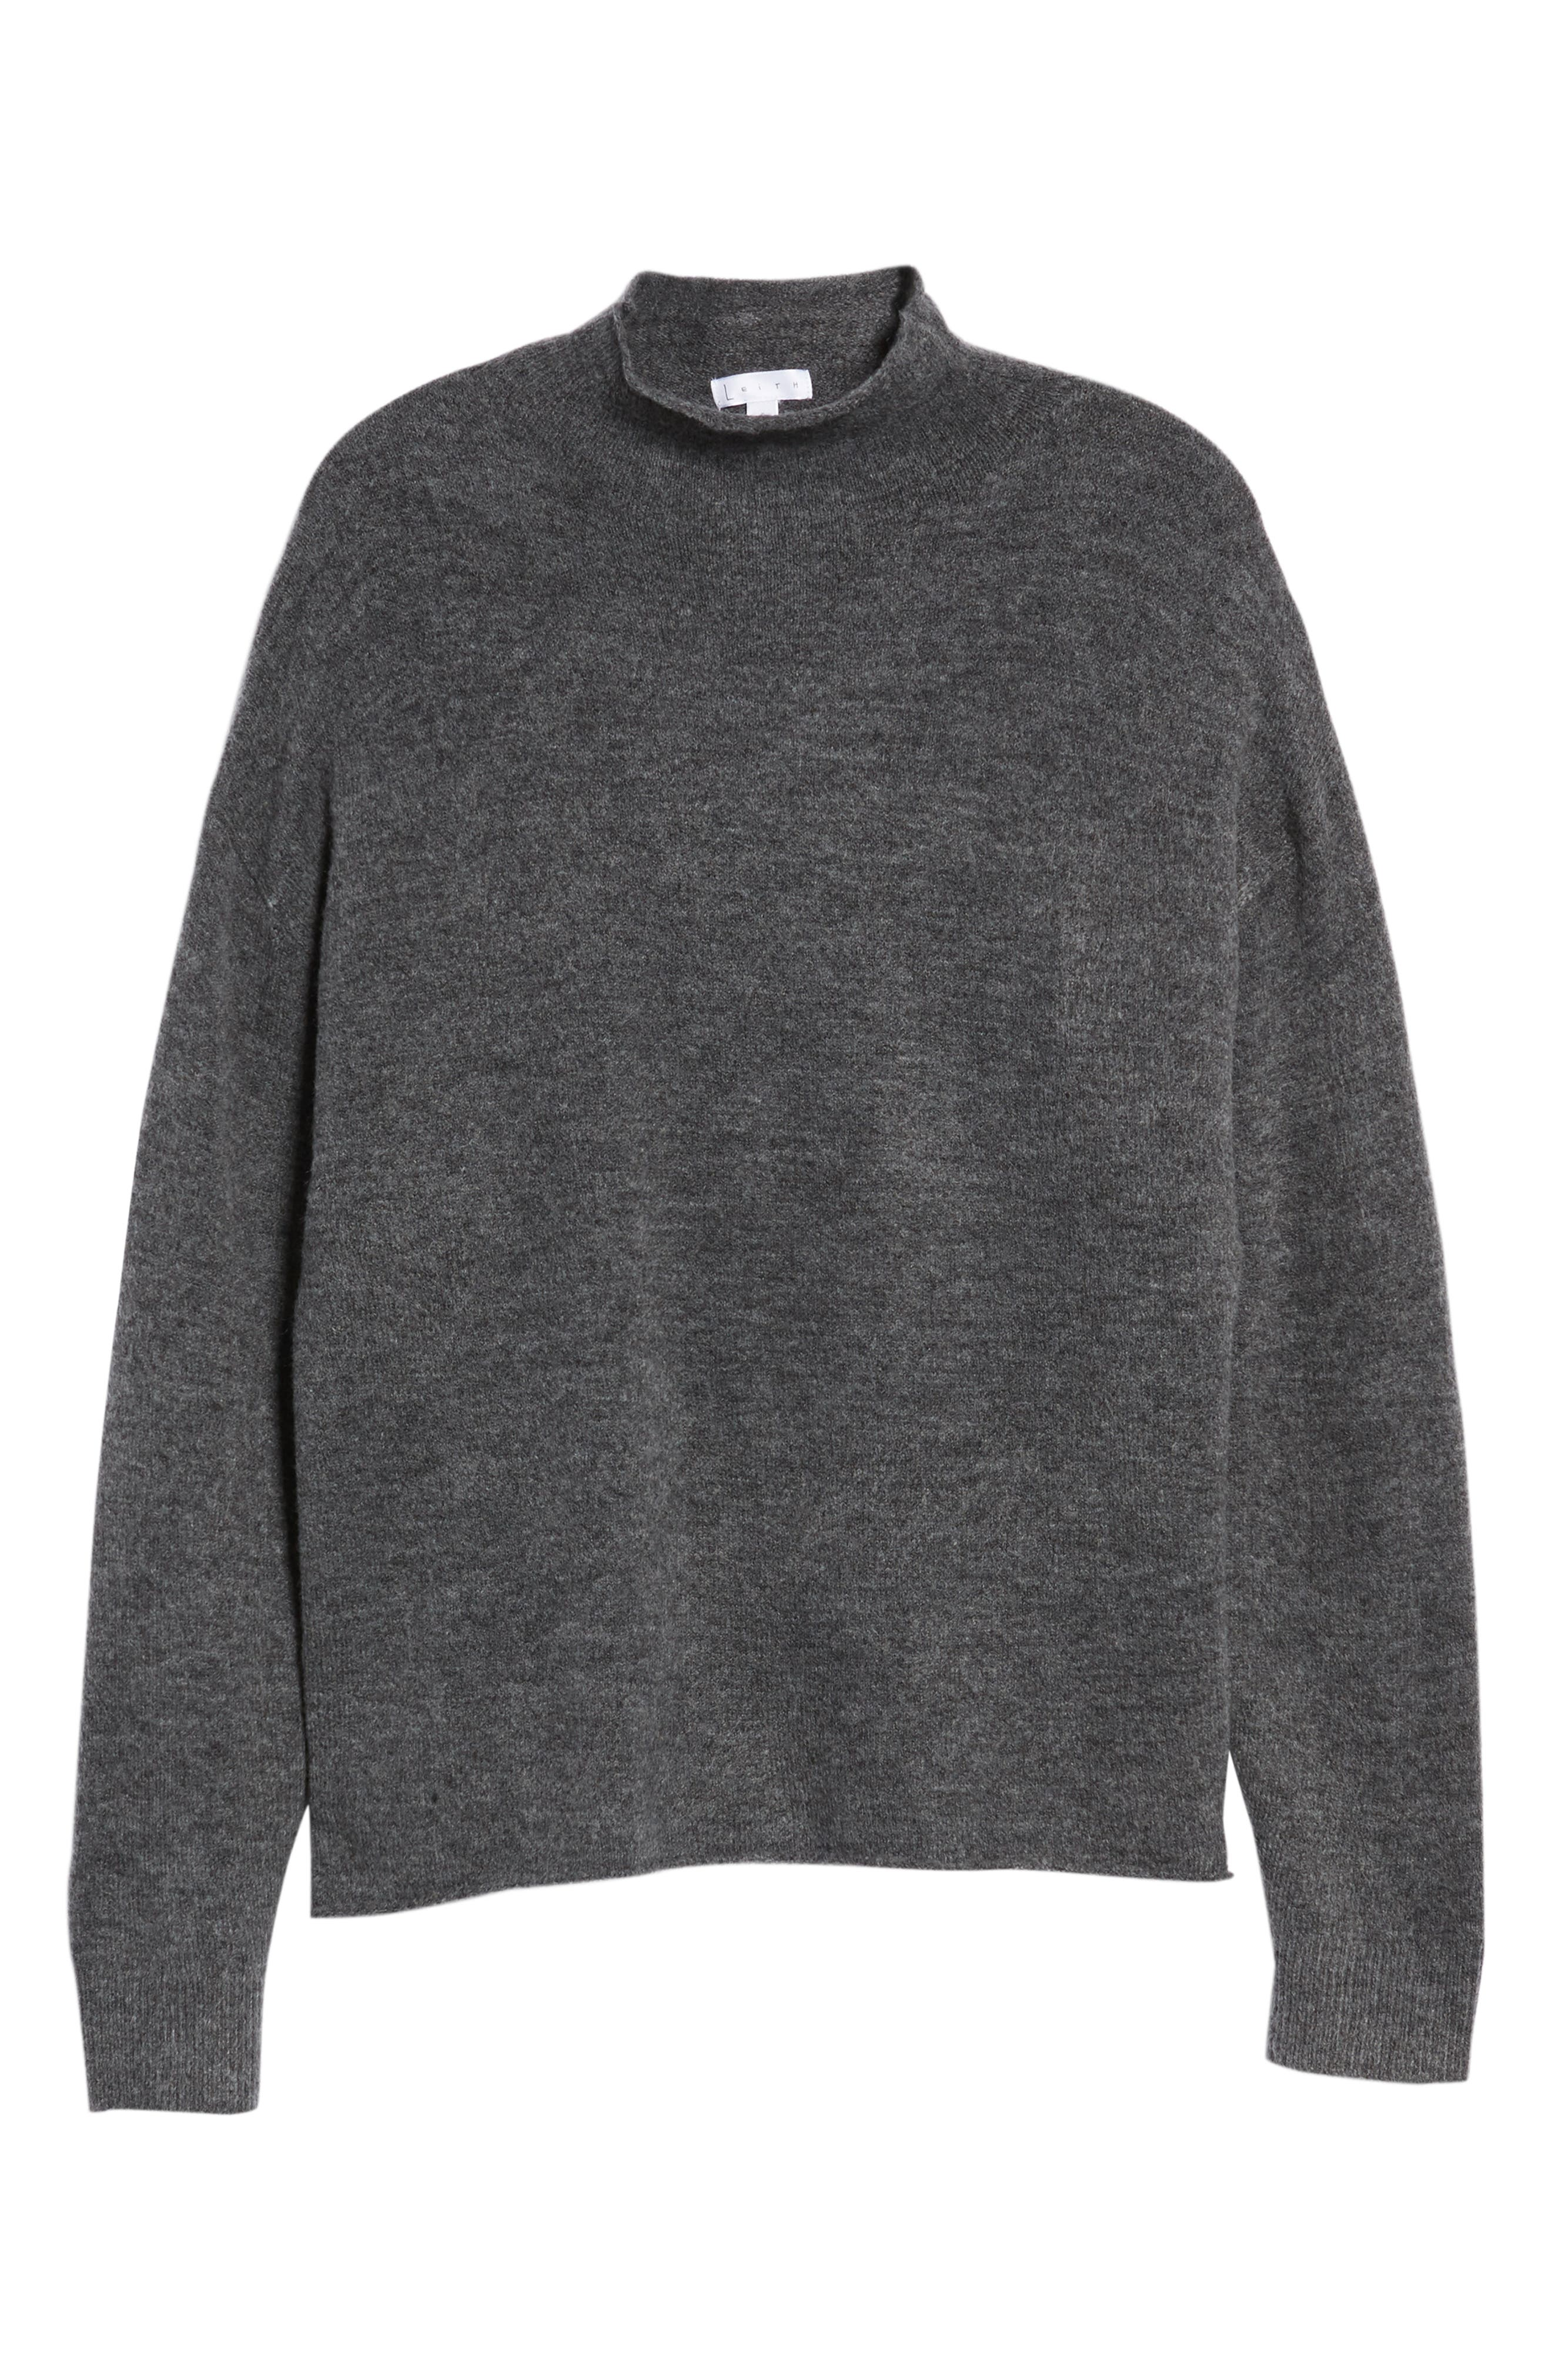 Cozy Mock Neck Sweater,                             Alternate thumbnail 7, color,                             GREY MEDIUM CHARCOAL HEATHER